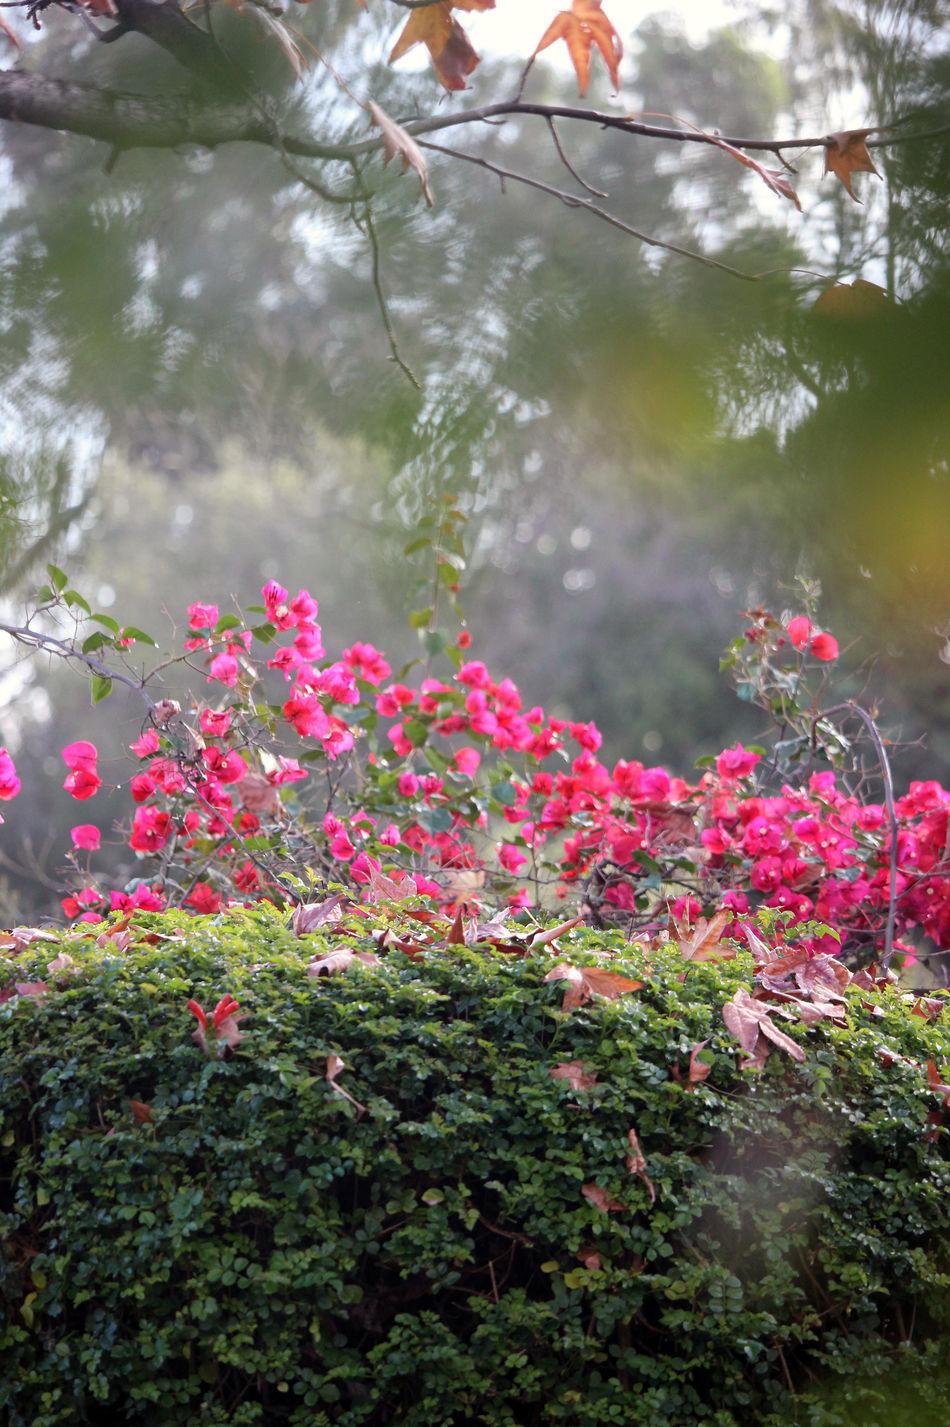 Backyard Birder Bogenvilla Fall And Spring Fl Flowering Shrubs Hazy Flower Garde Misty Misty Morning Scientific Meaning Pastel Power! Pastel Power